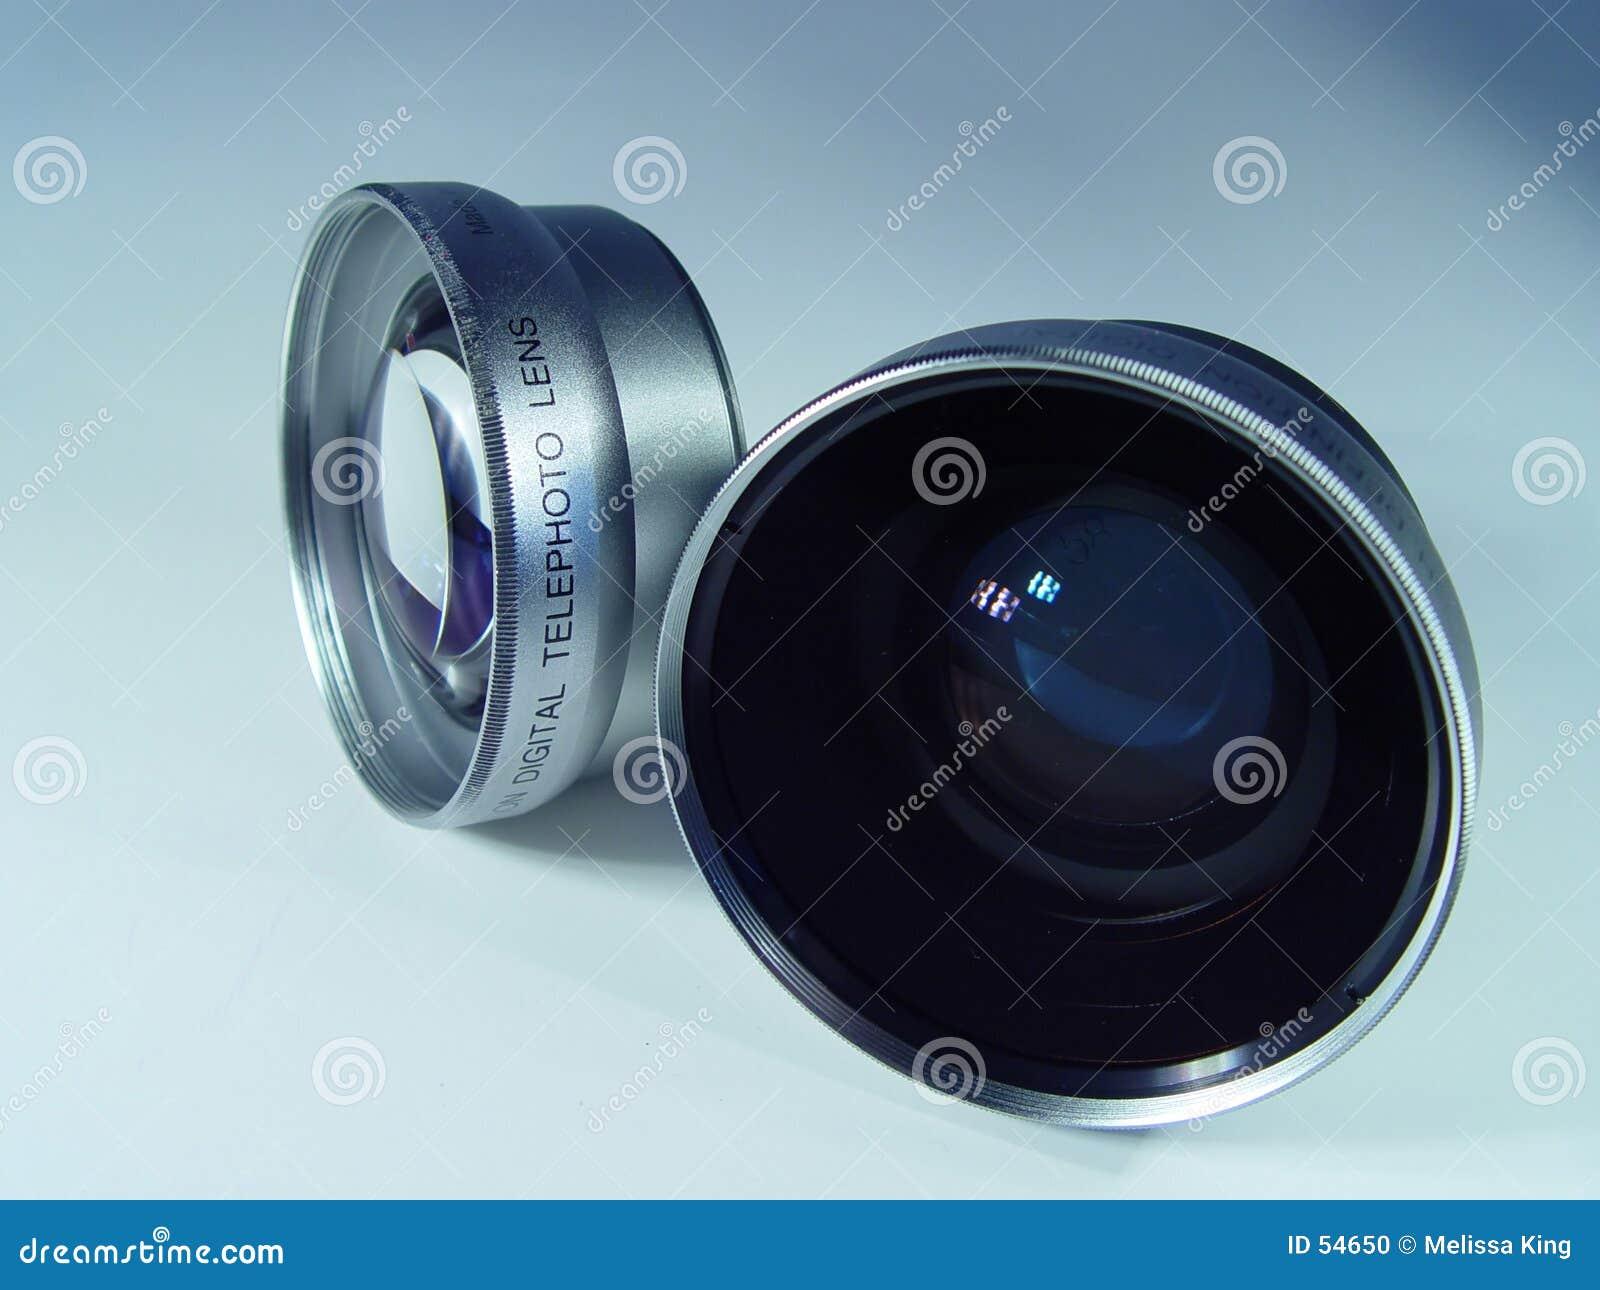 Two Camera Lens